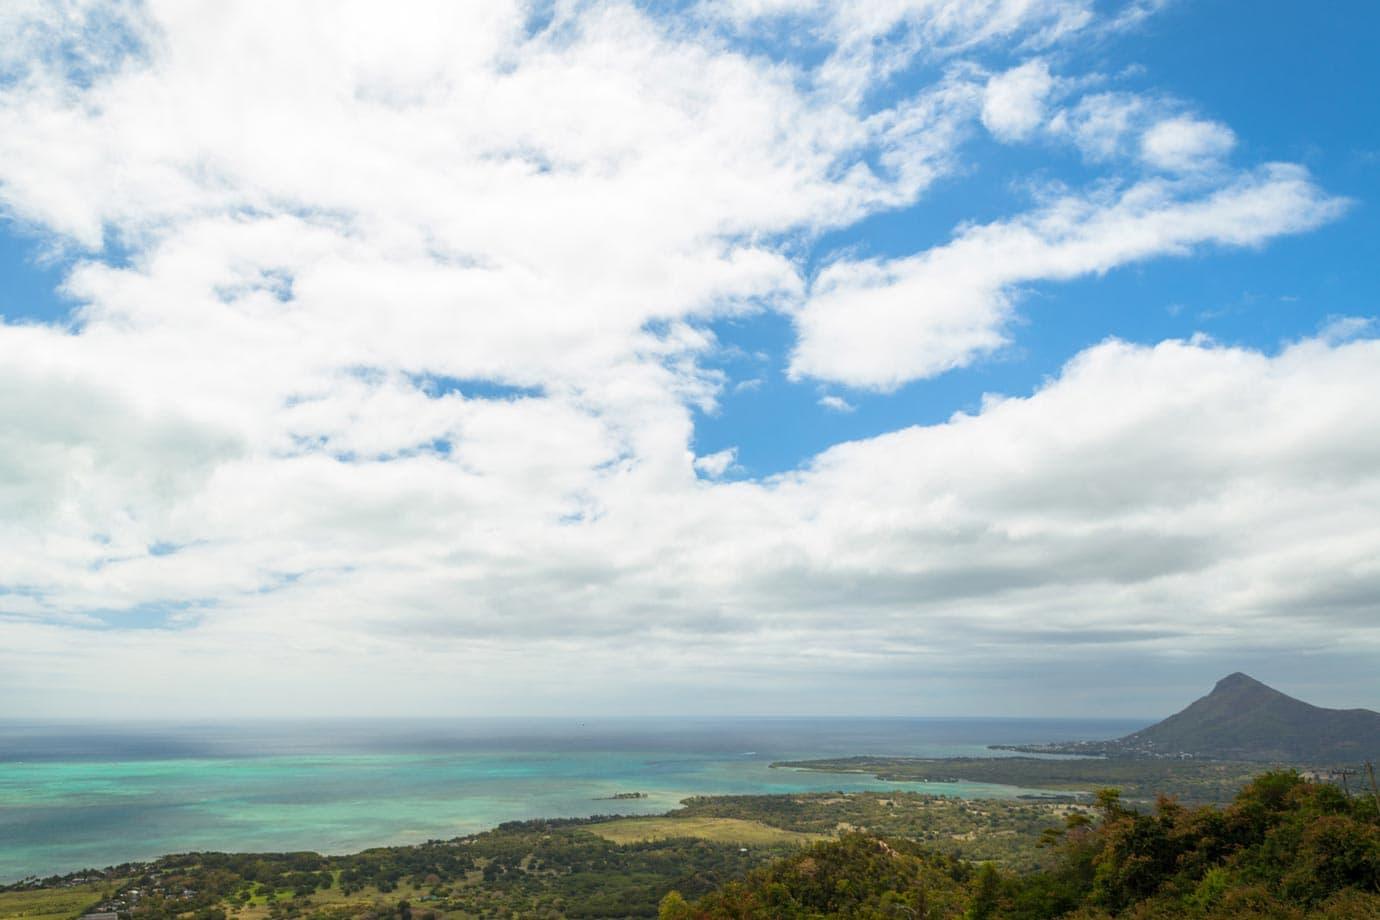 Views of Mauritius